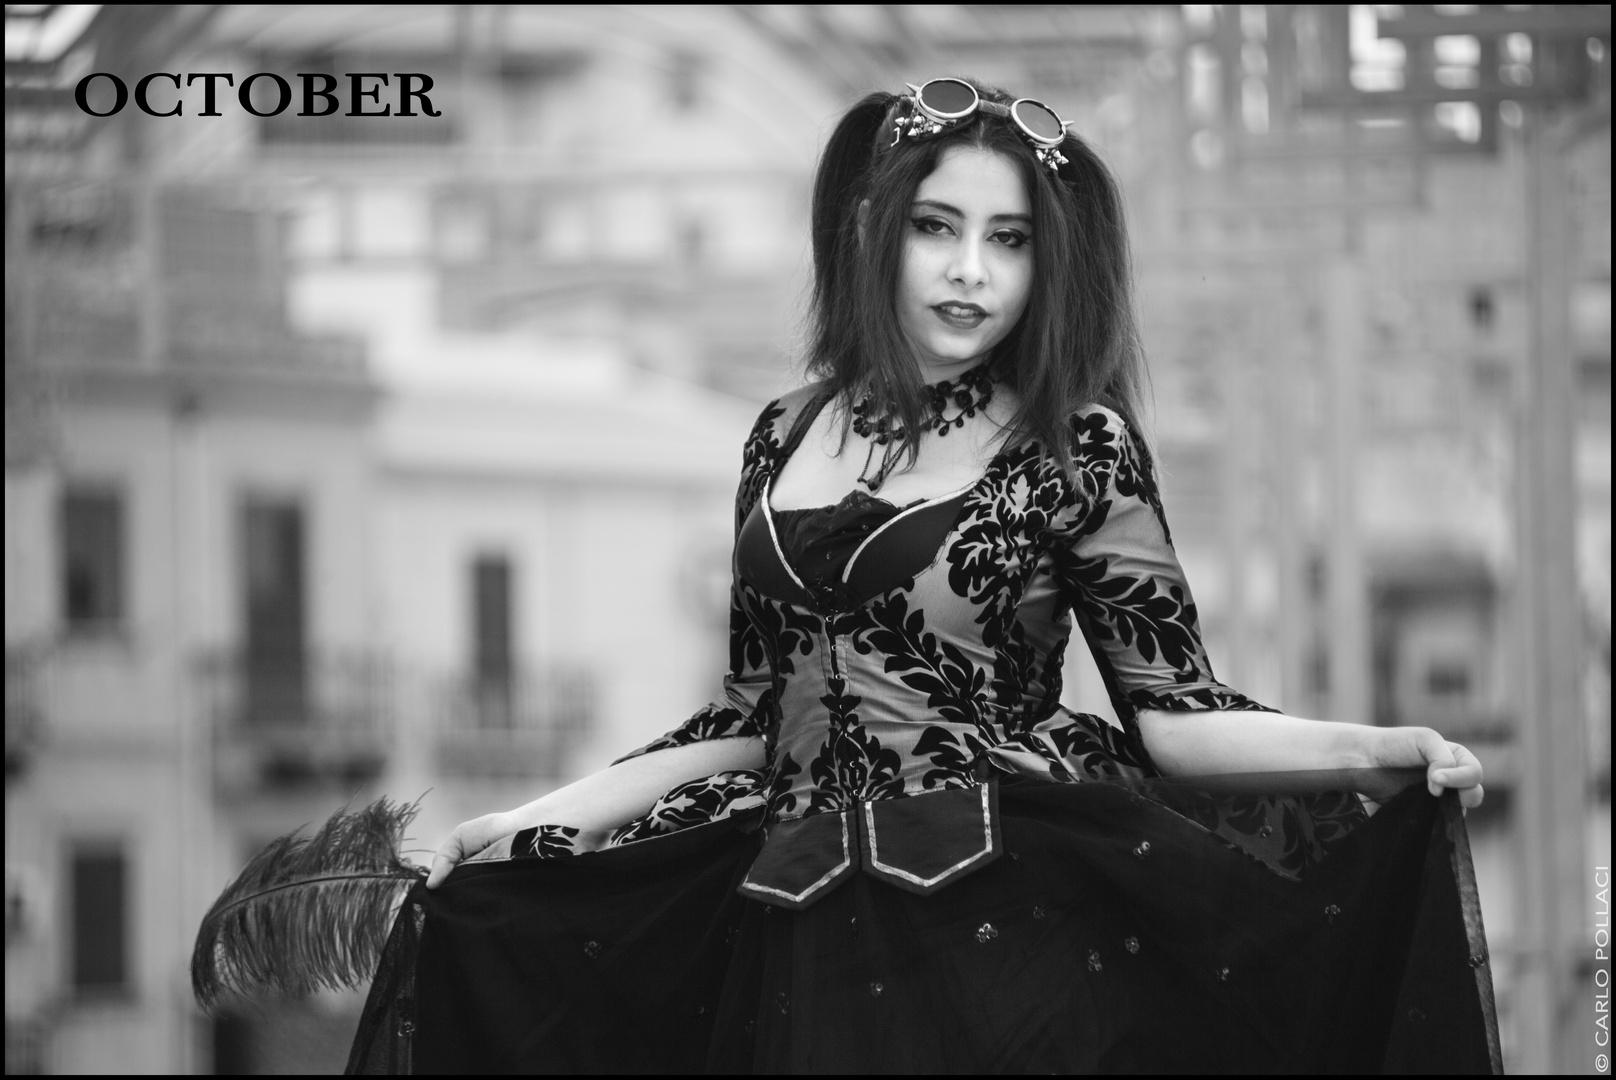 My 2017 calendar - October